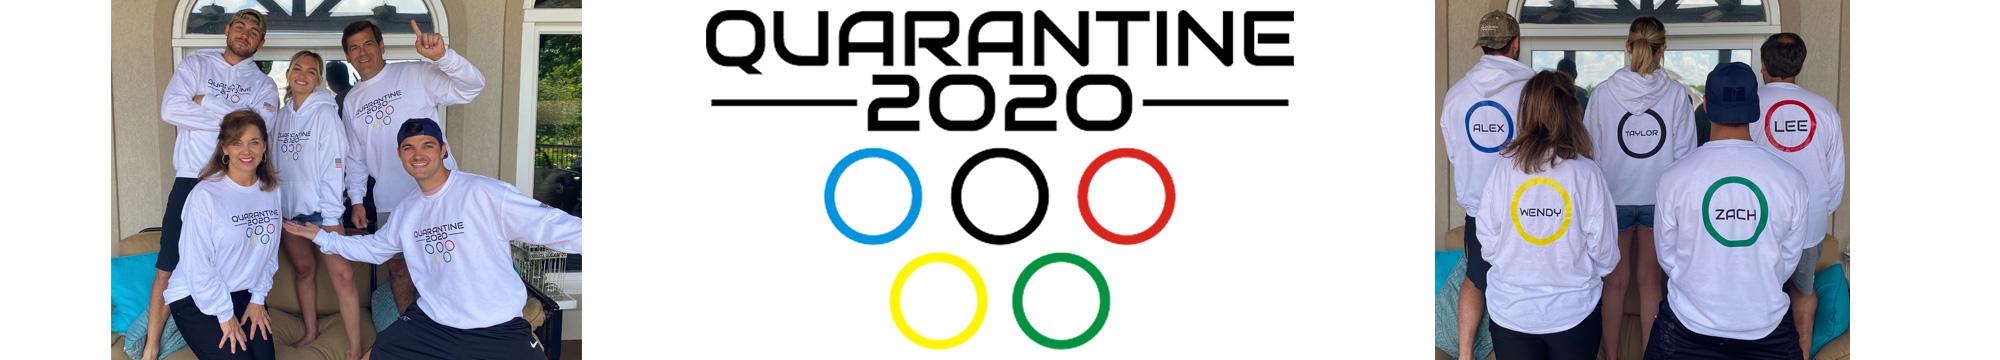 Quarantine Olypmpics